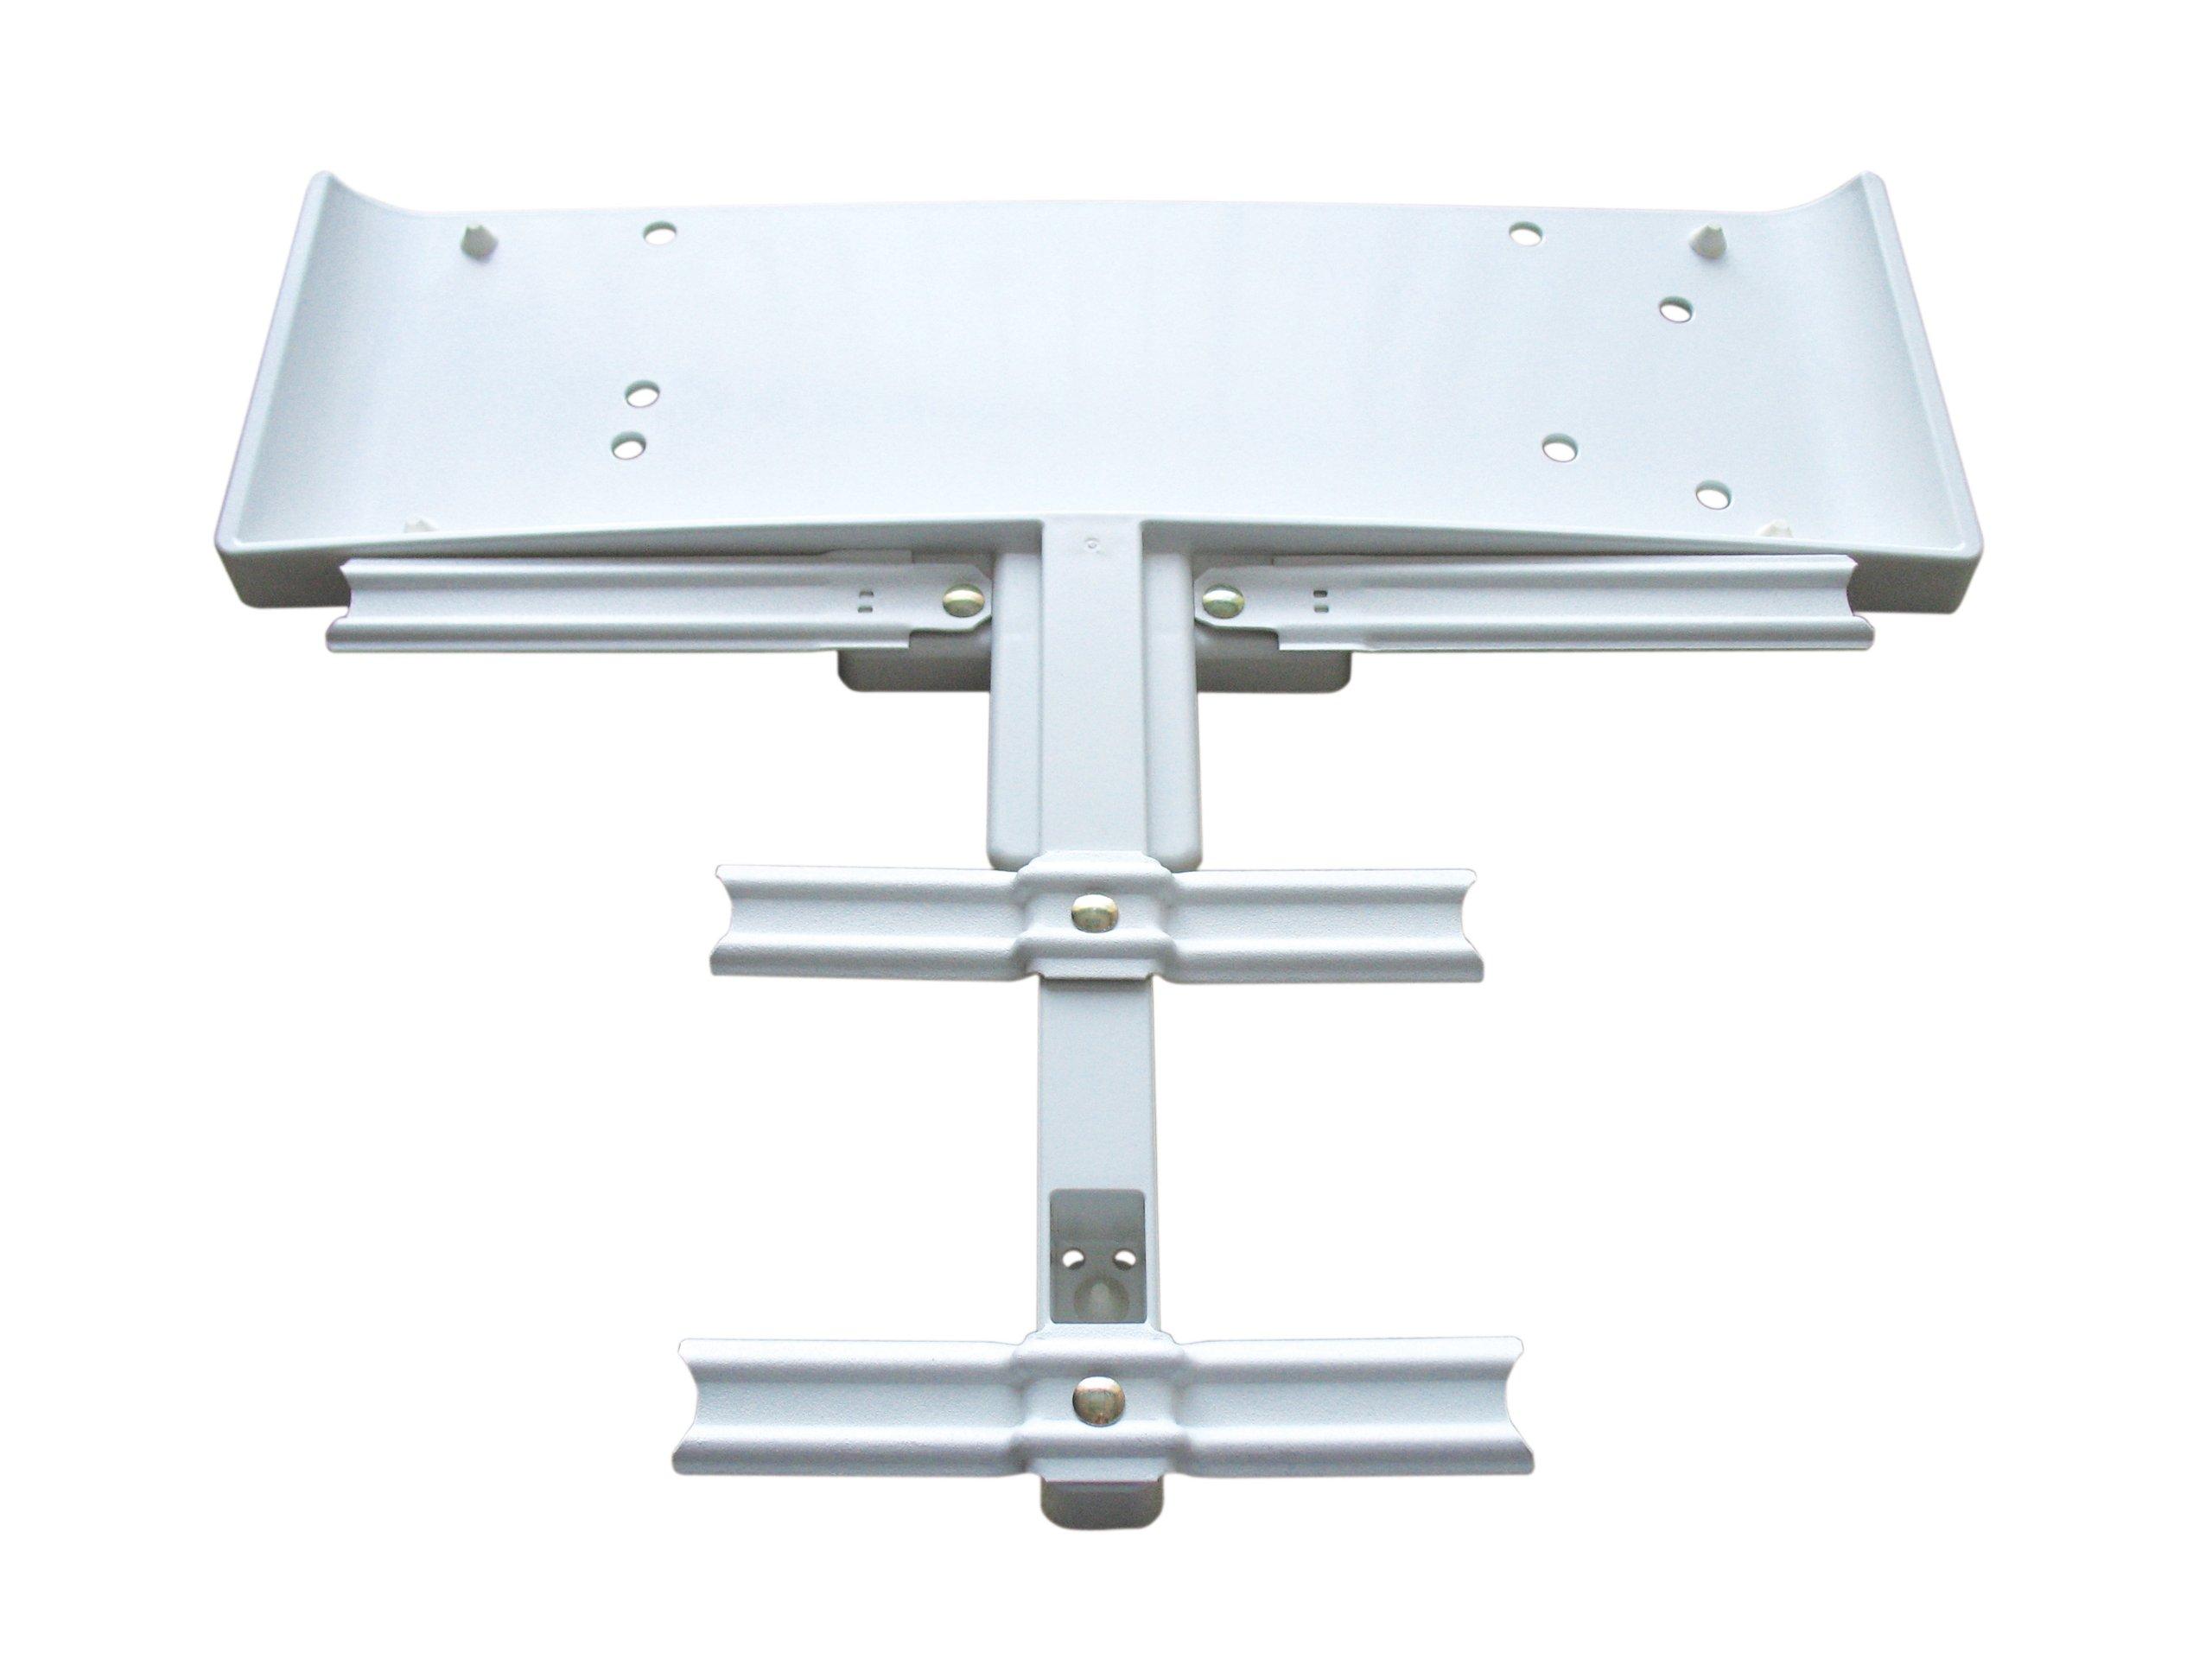 Winegard RV-WING Wingman UHF RV TV Antenna Booster for the Winegard Sensar Batwing (Digital RV TV Antenna, Easy Installation, Increases Digital UHF TV Reception) - White by Winegard